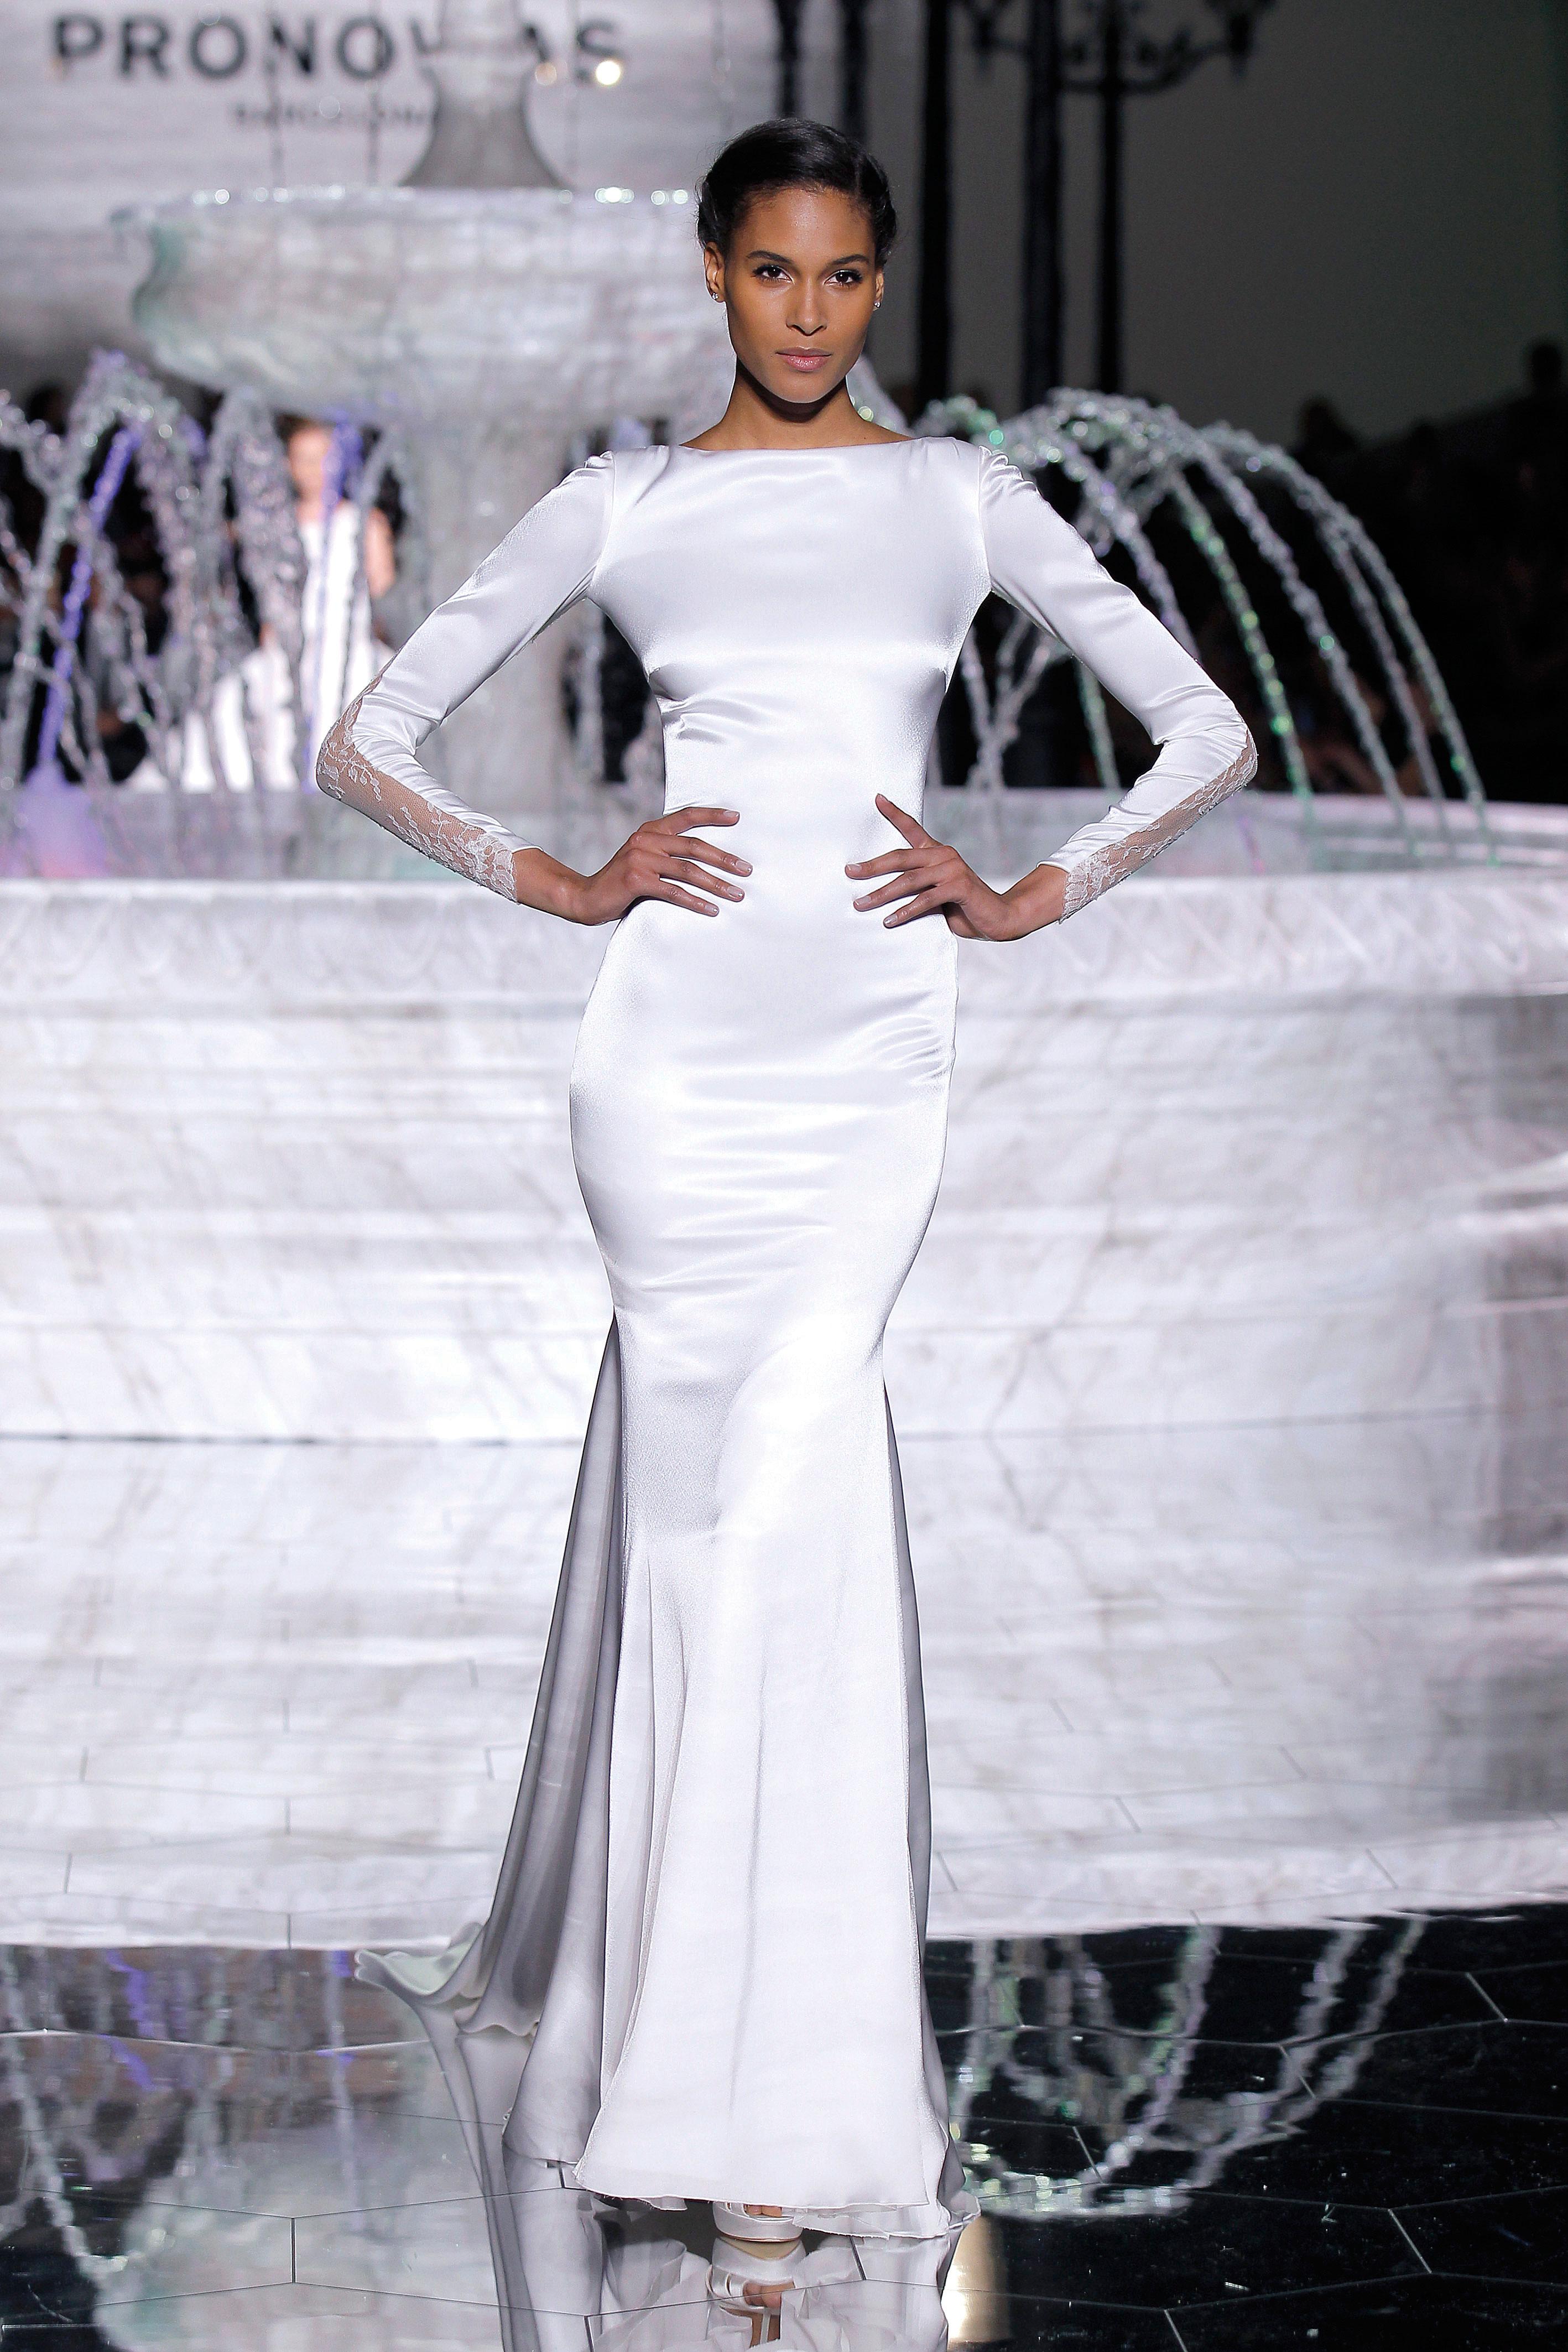 pronovias long sleeves wedding dress spring 2018